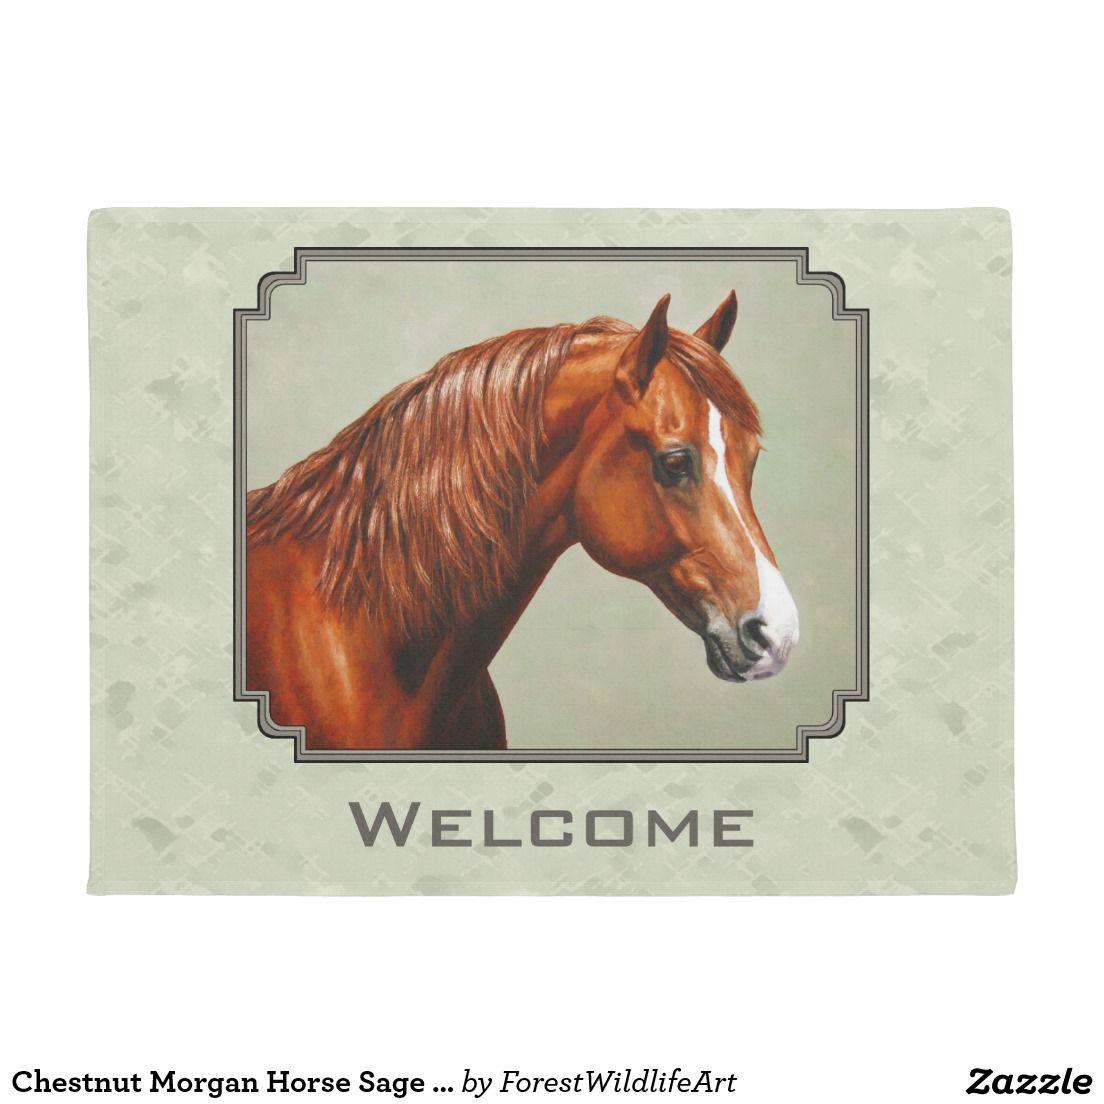 Chestnut Morgan Horse Sage Green Doormat   Doormats, Horses and Green